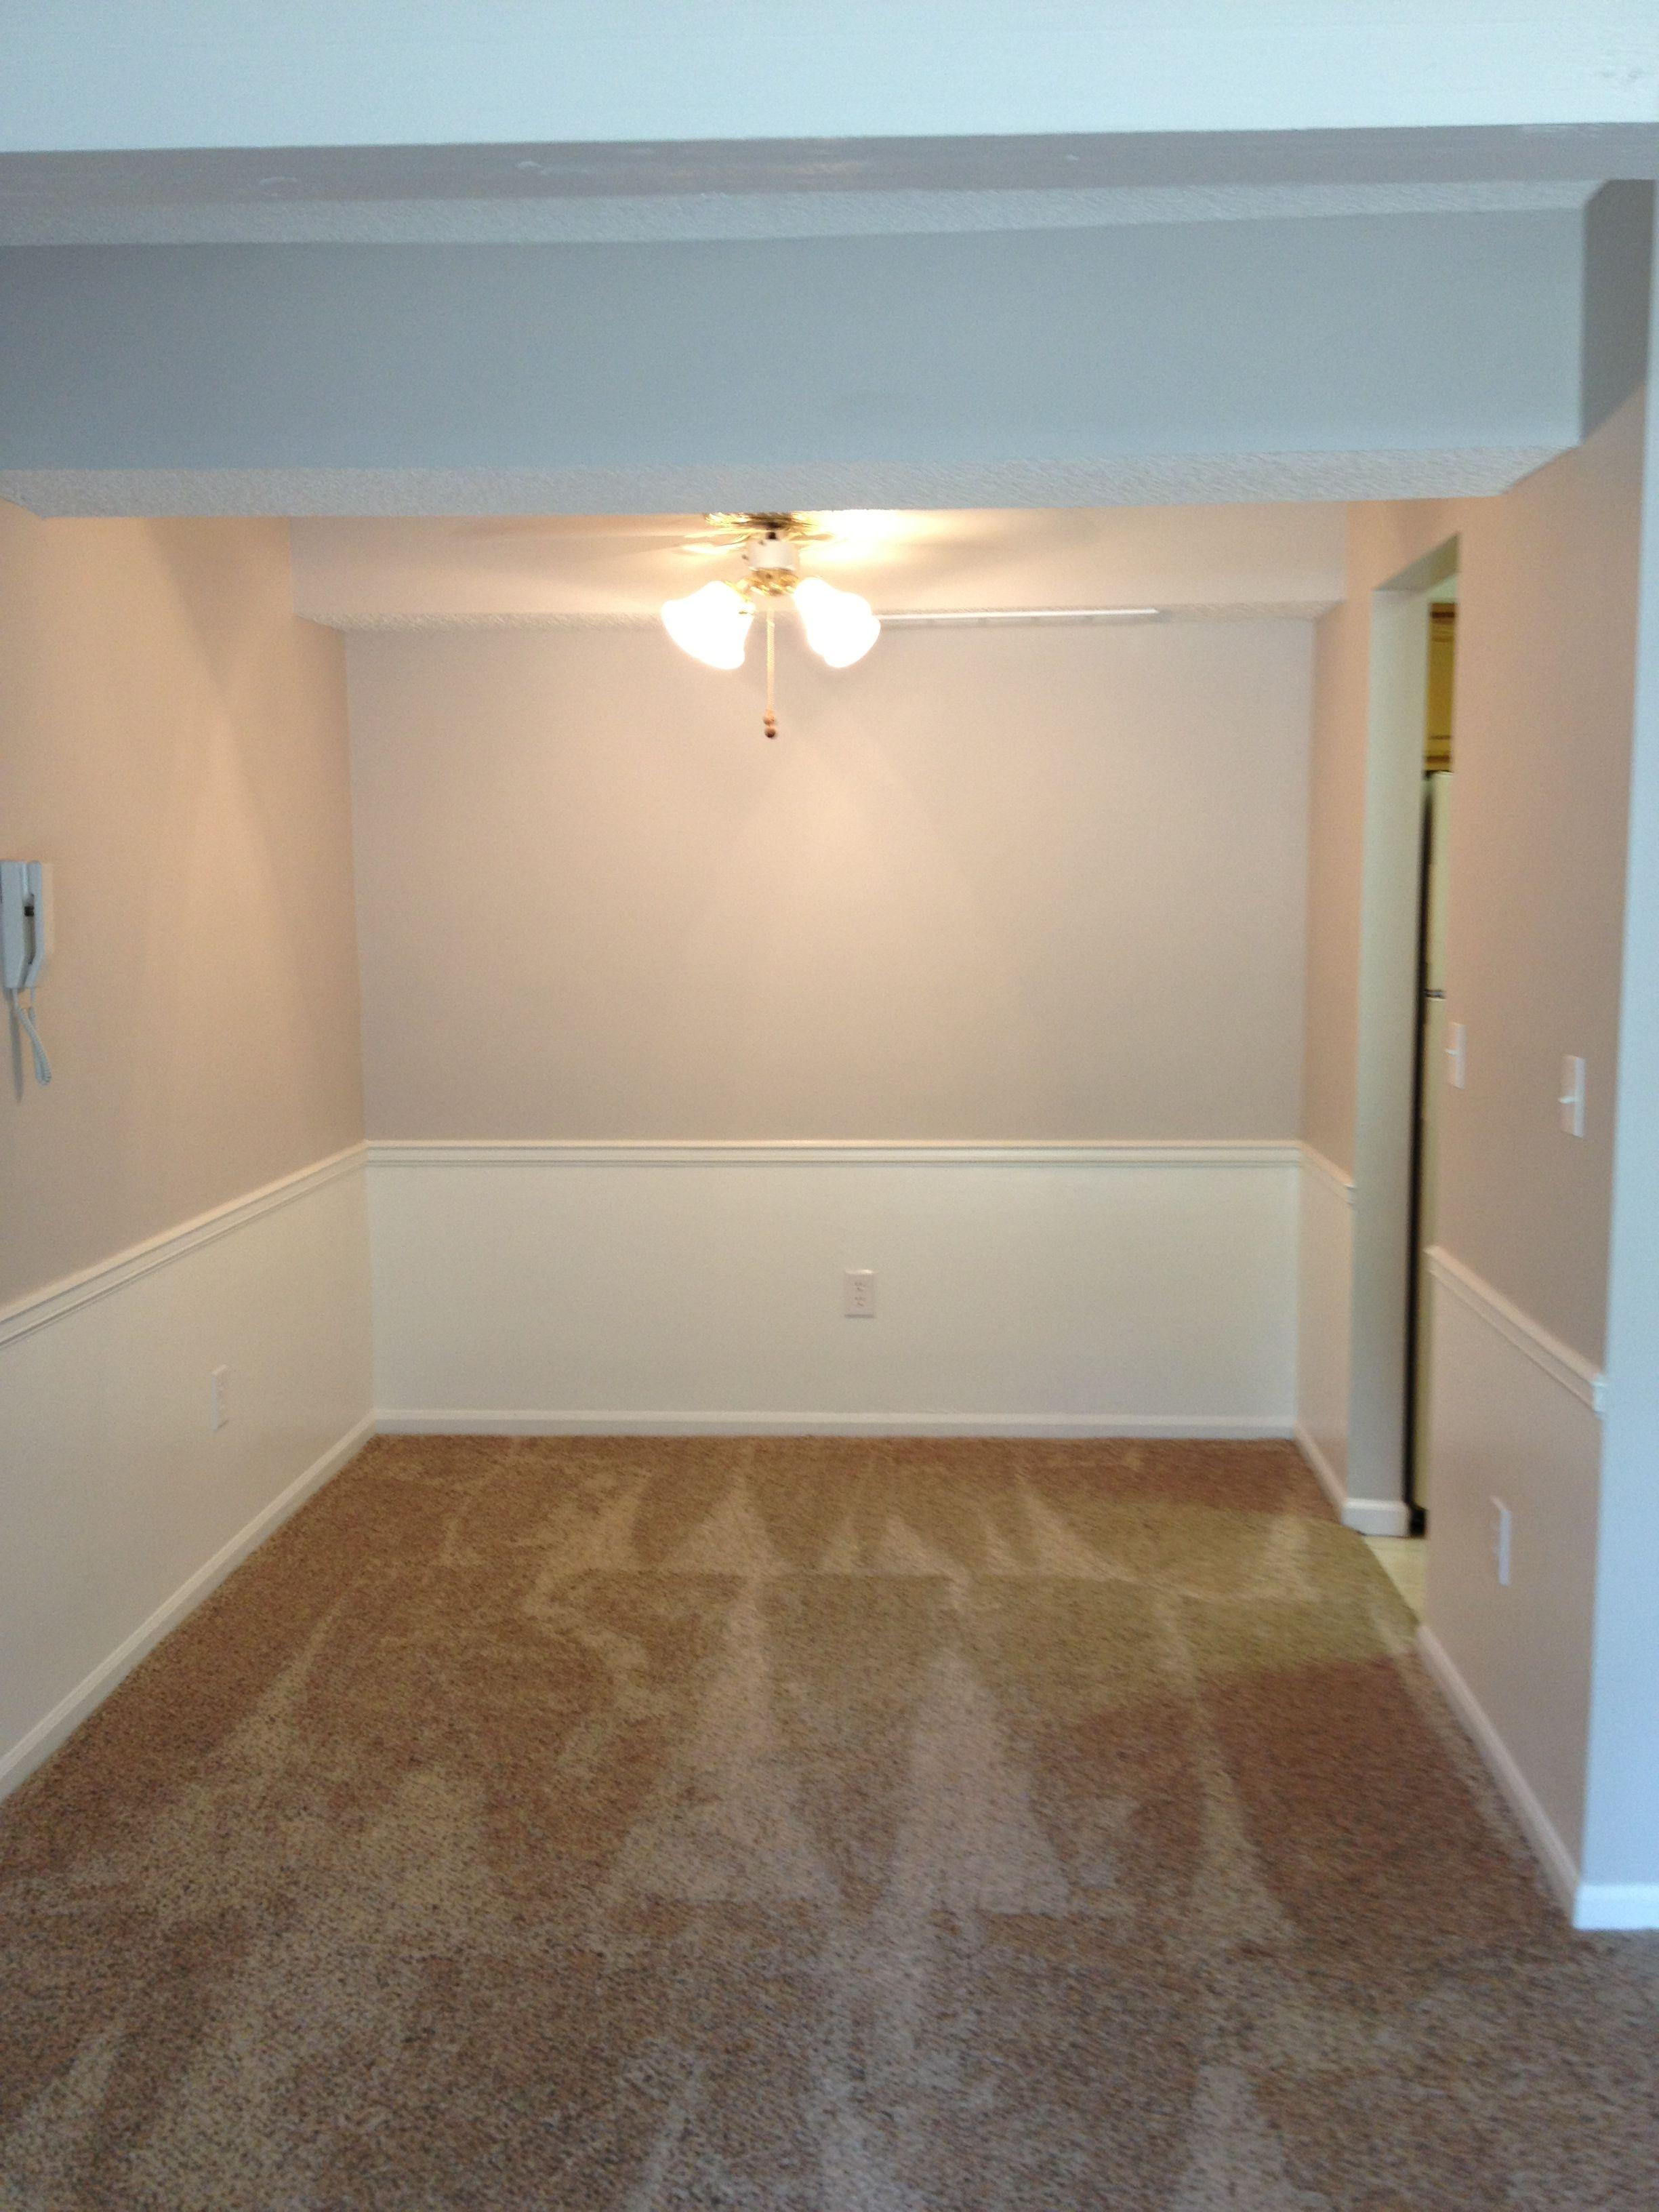 8x8 Bedroom Design: Dining Room (8x8)